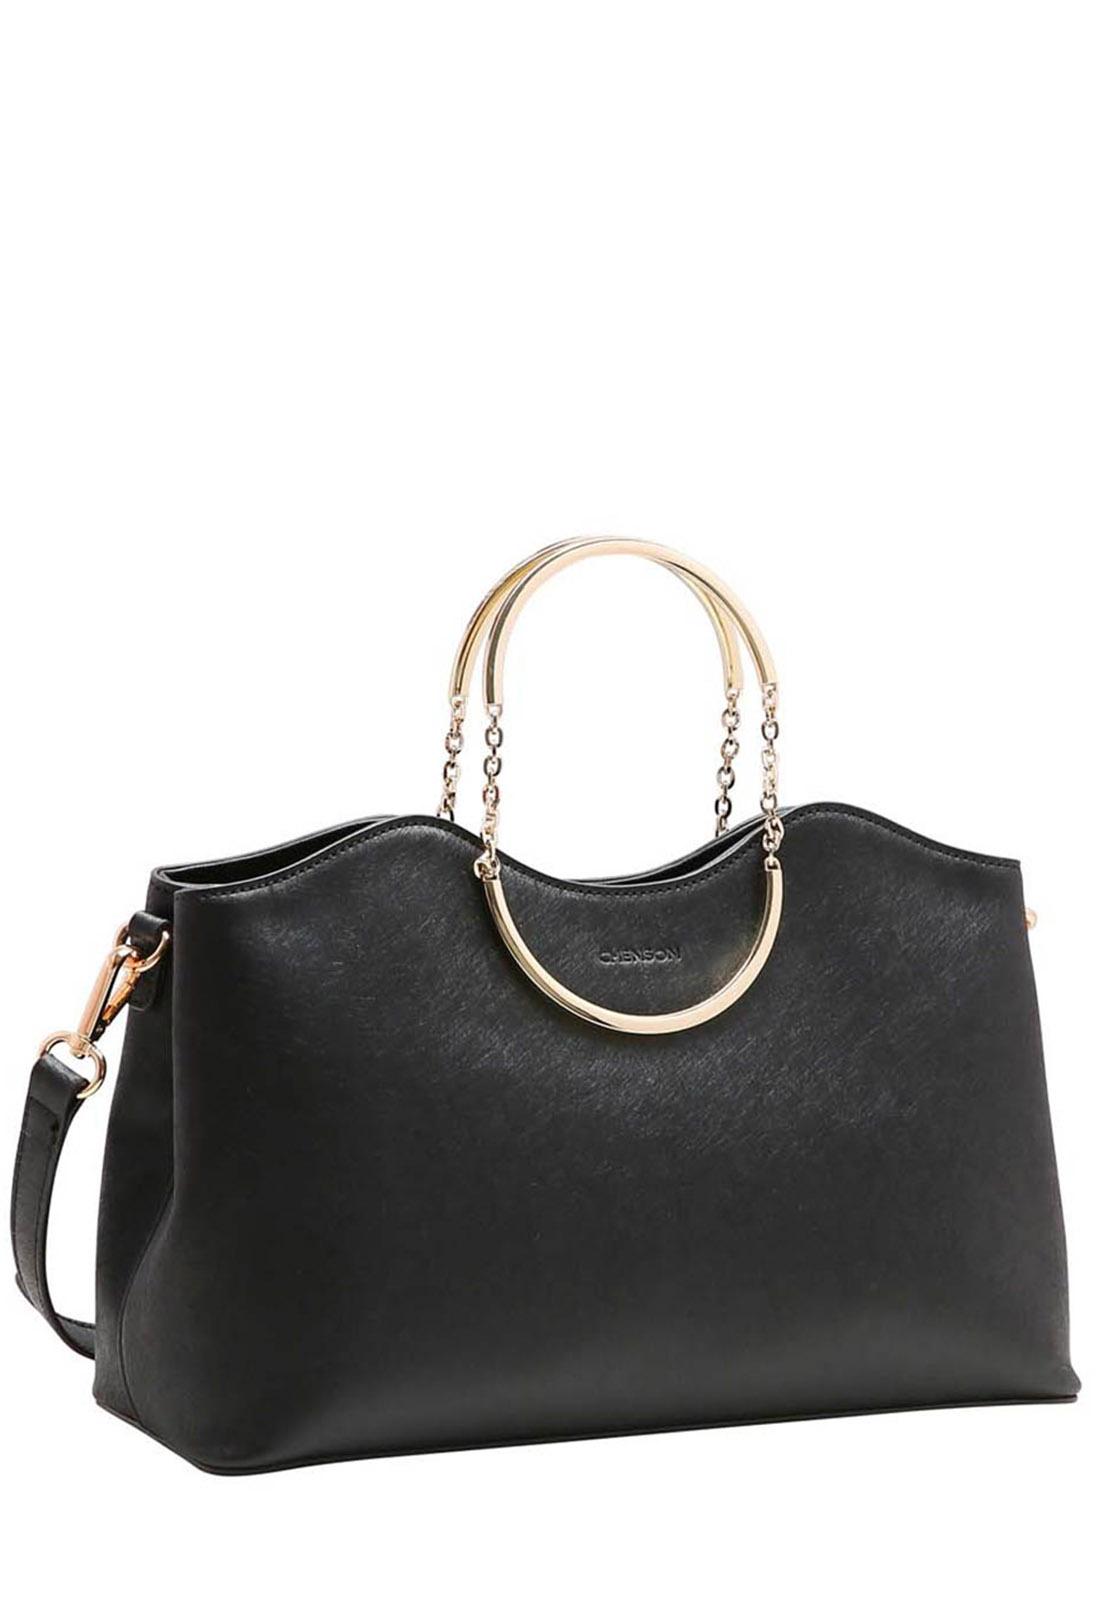 Bolsa Feminina Chenson Elegance Mão 3483552